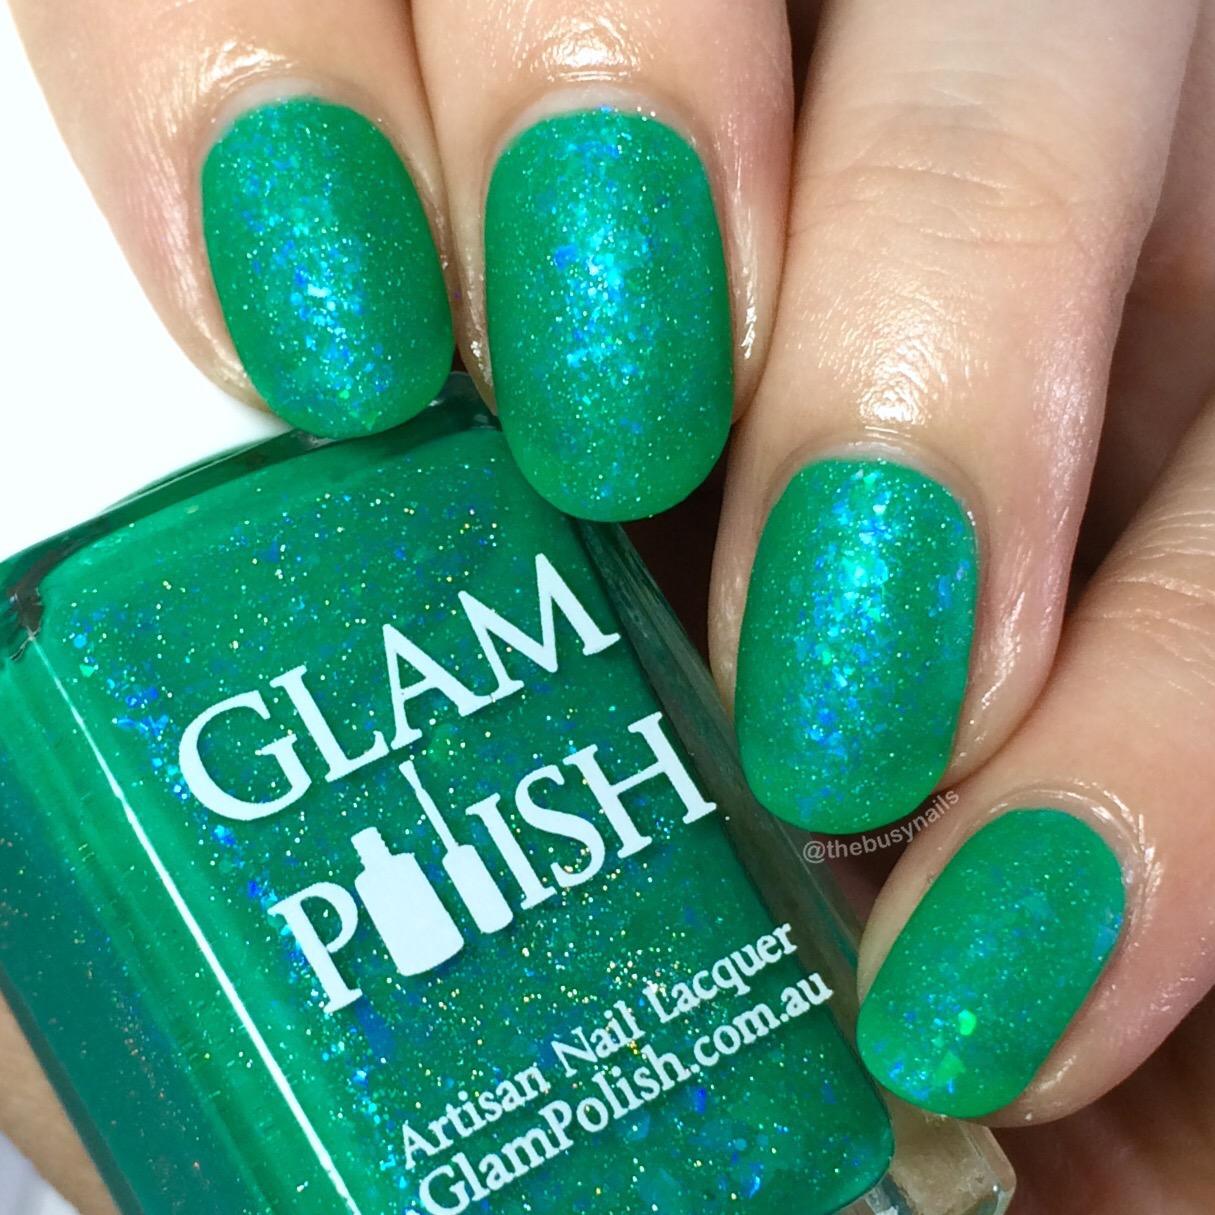 glam-polish-seaweed-greener1.jpg